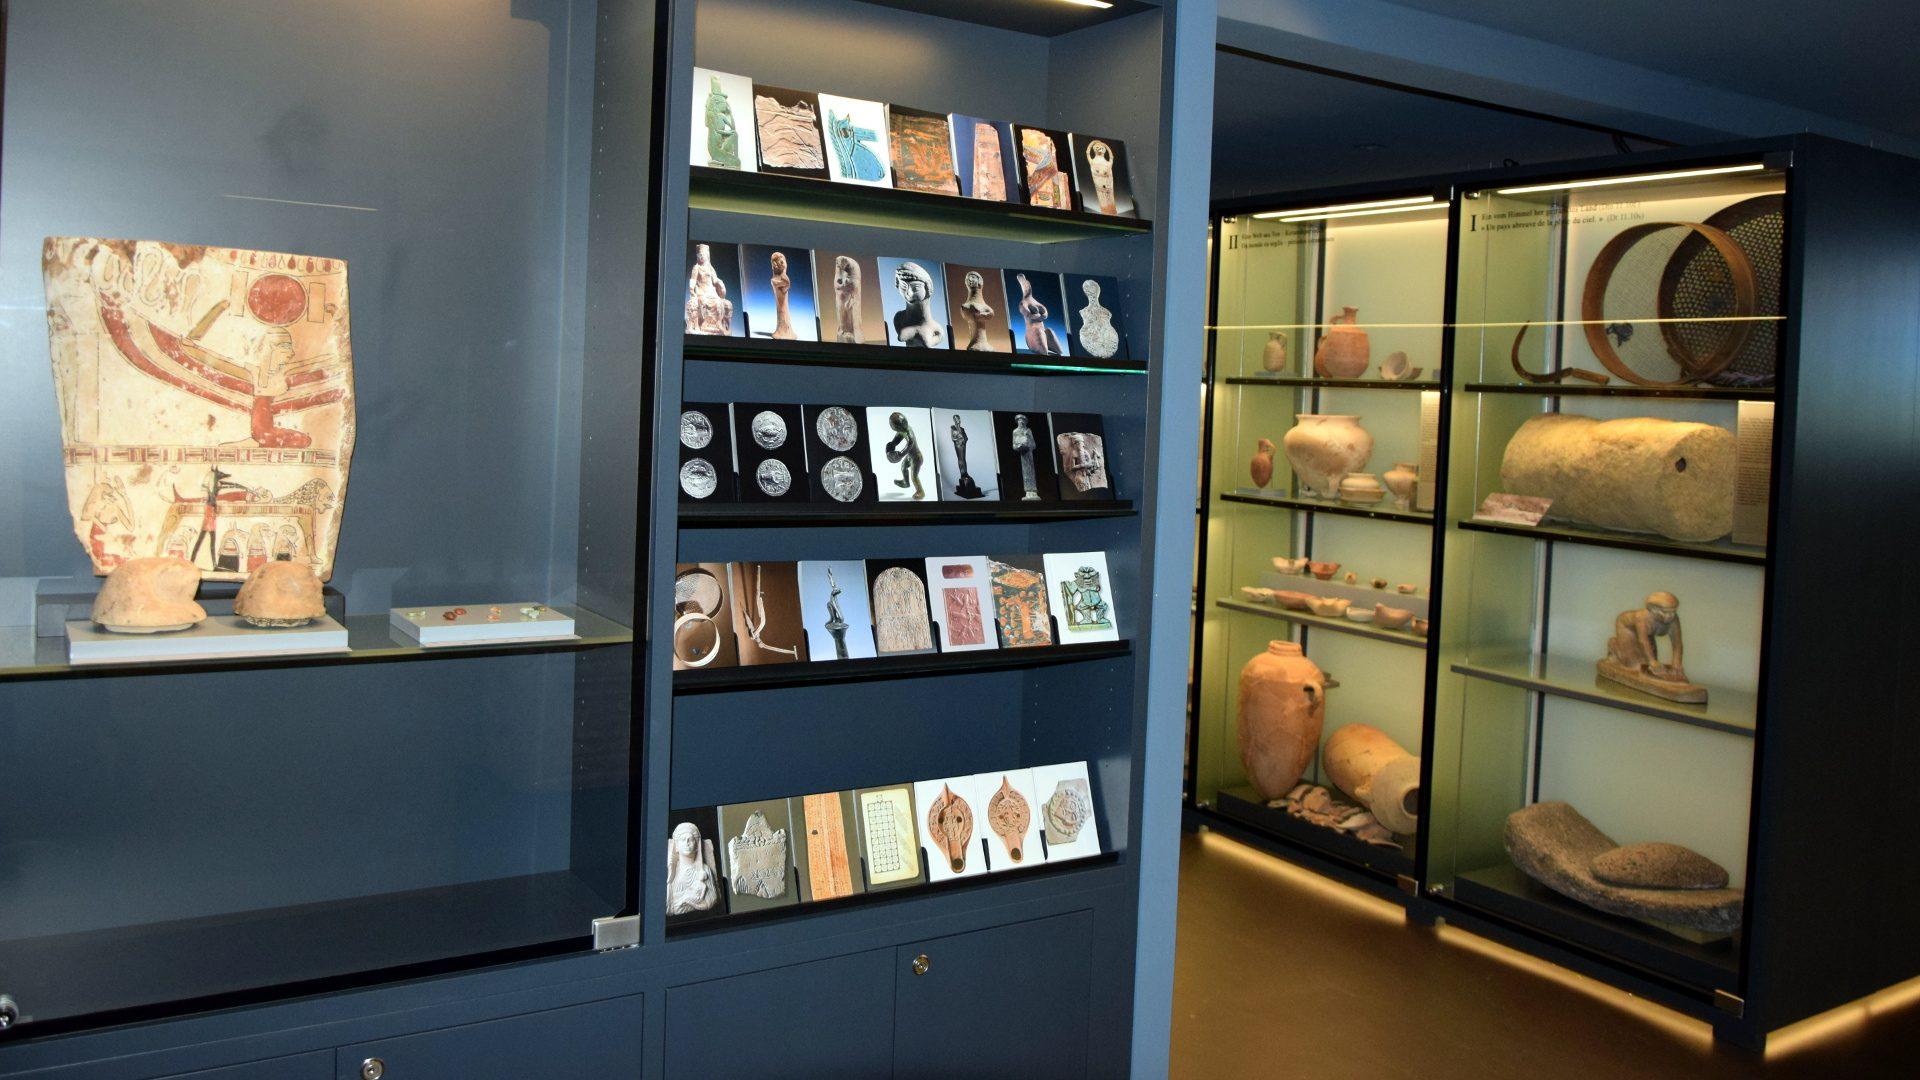 besuch im bibel orient museum freundeskreis theologiekurse. Black Bedroom Furniture Sets. Home Design Ideas